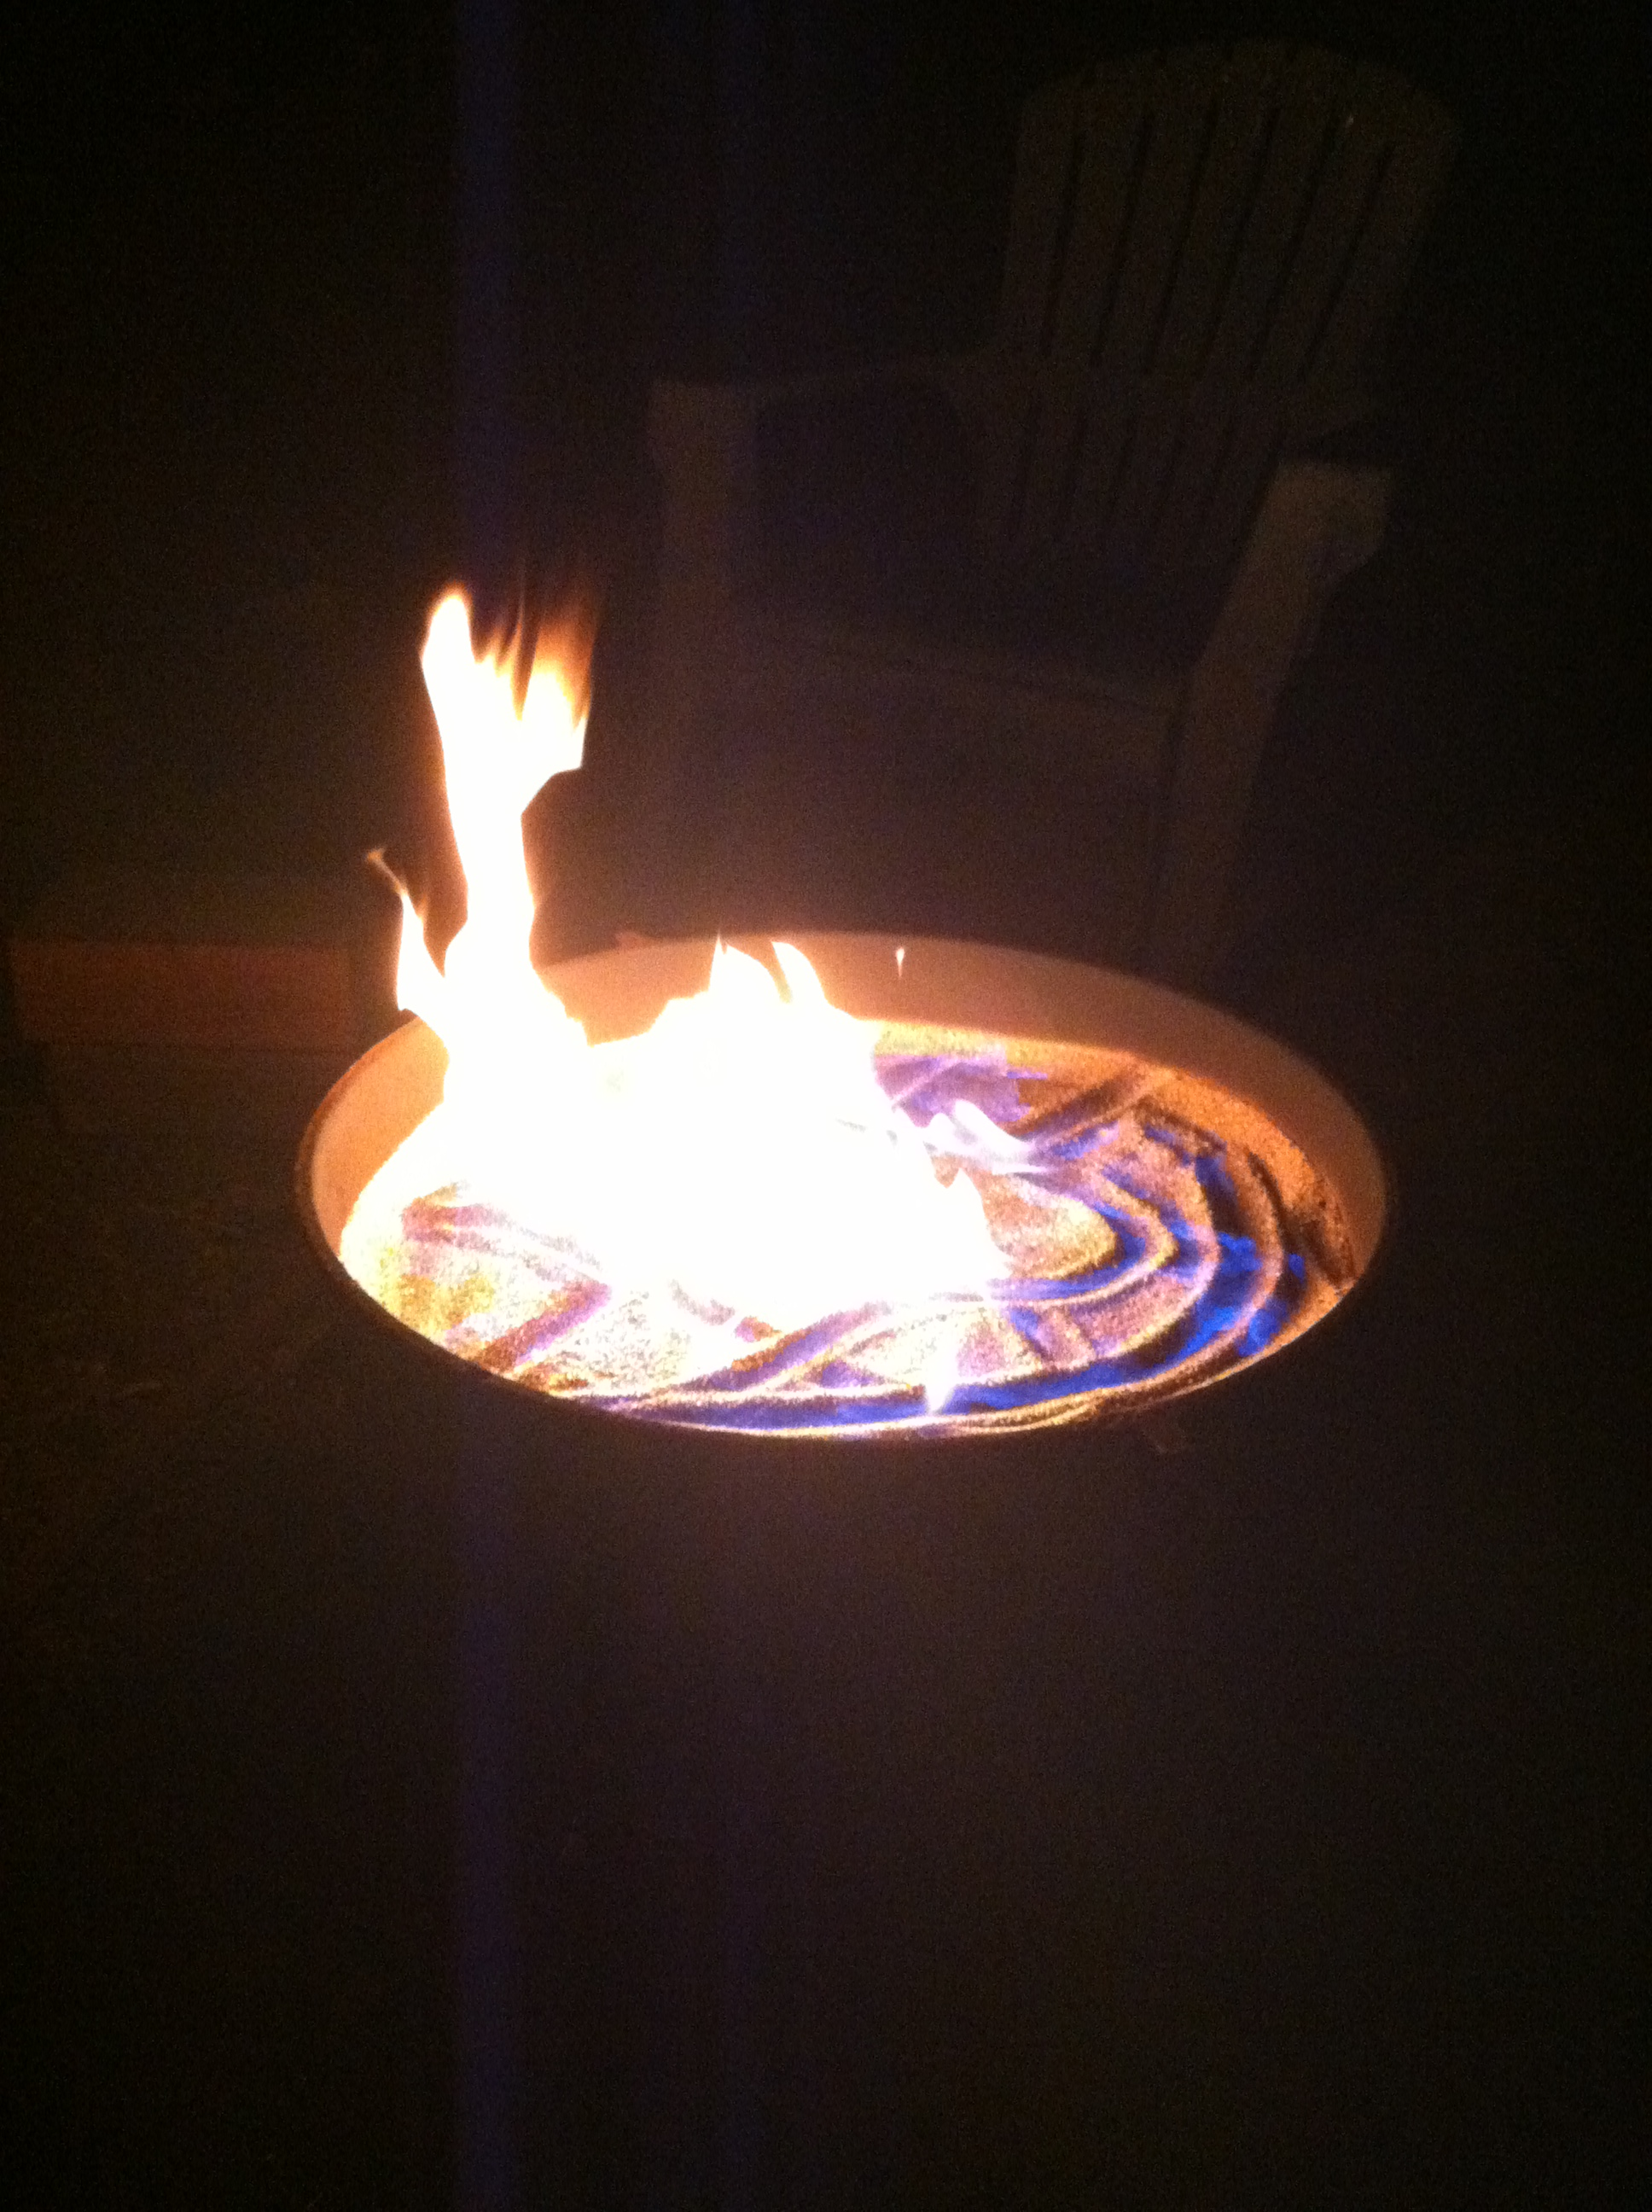 Flaming Cauldron Fire pit